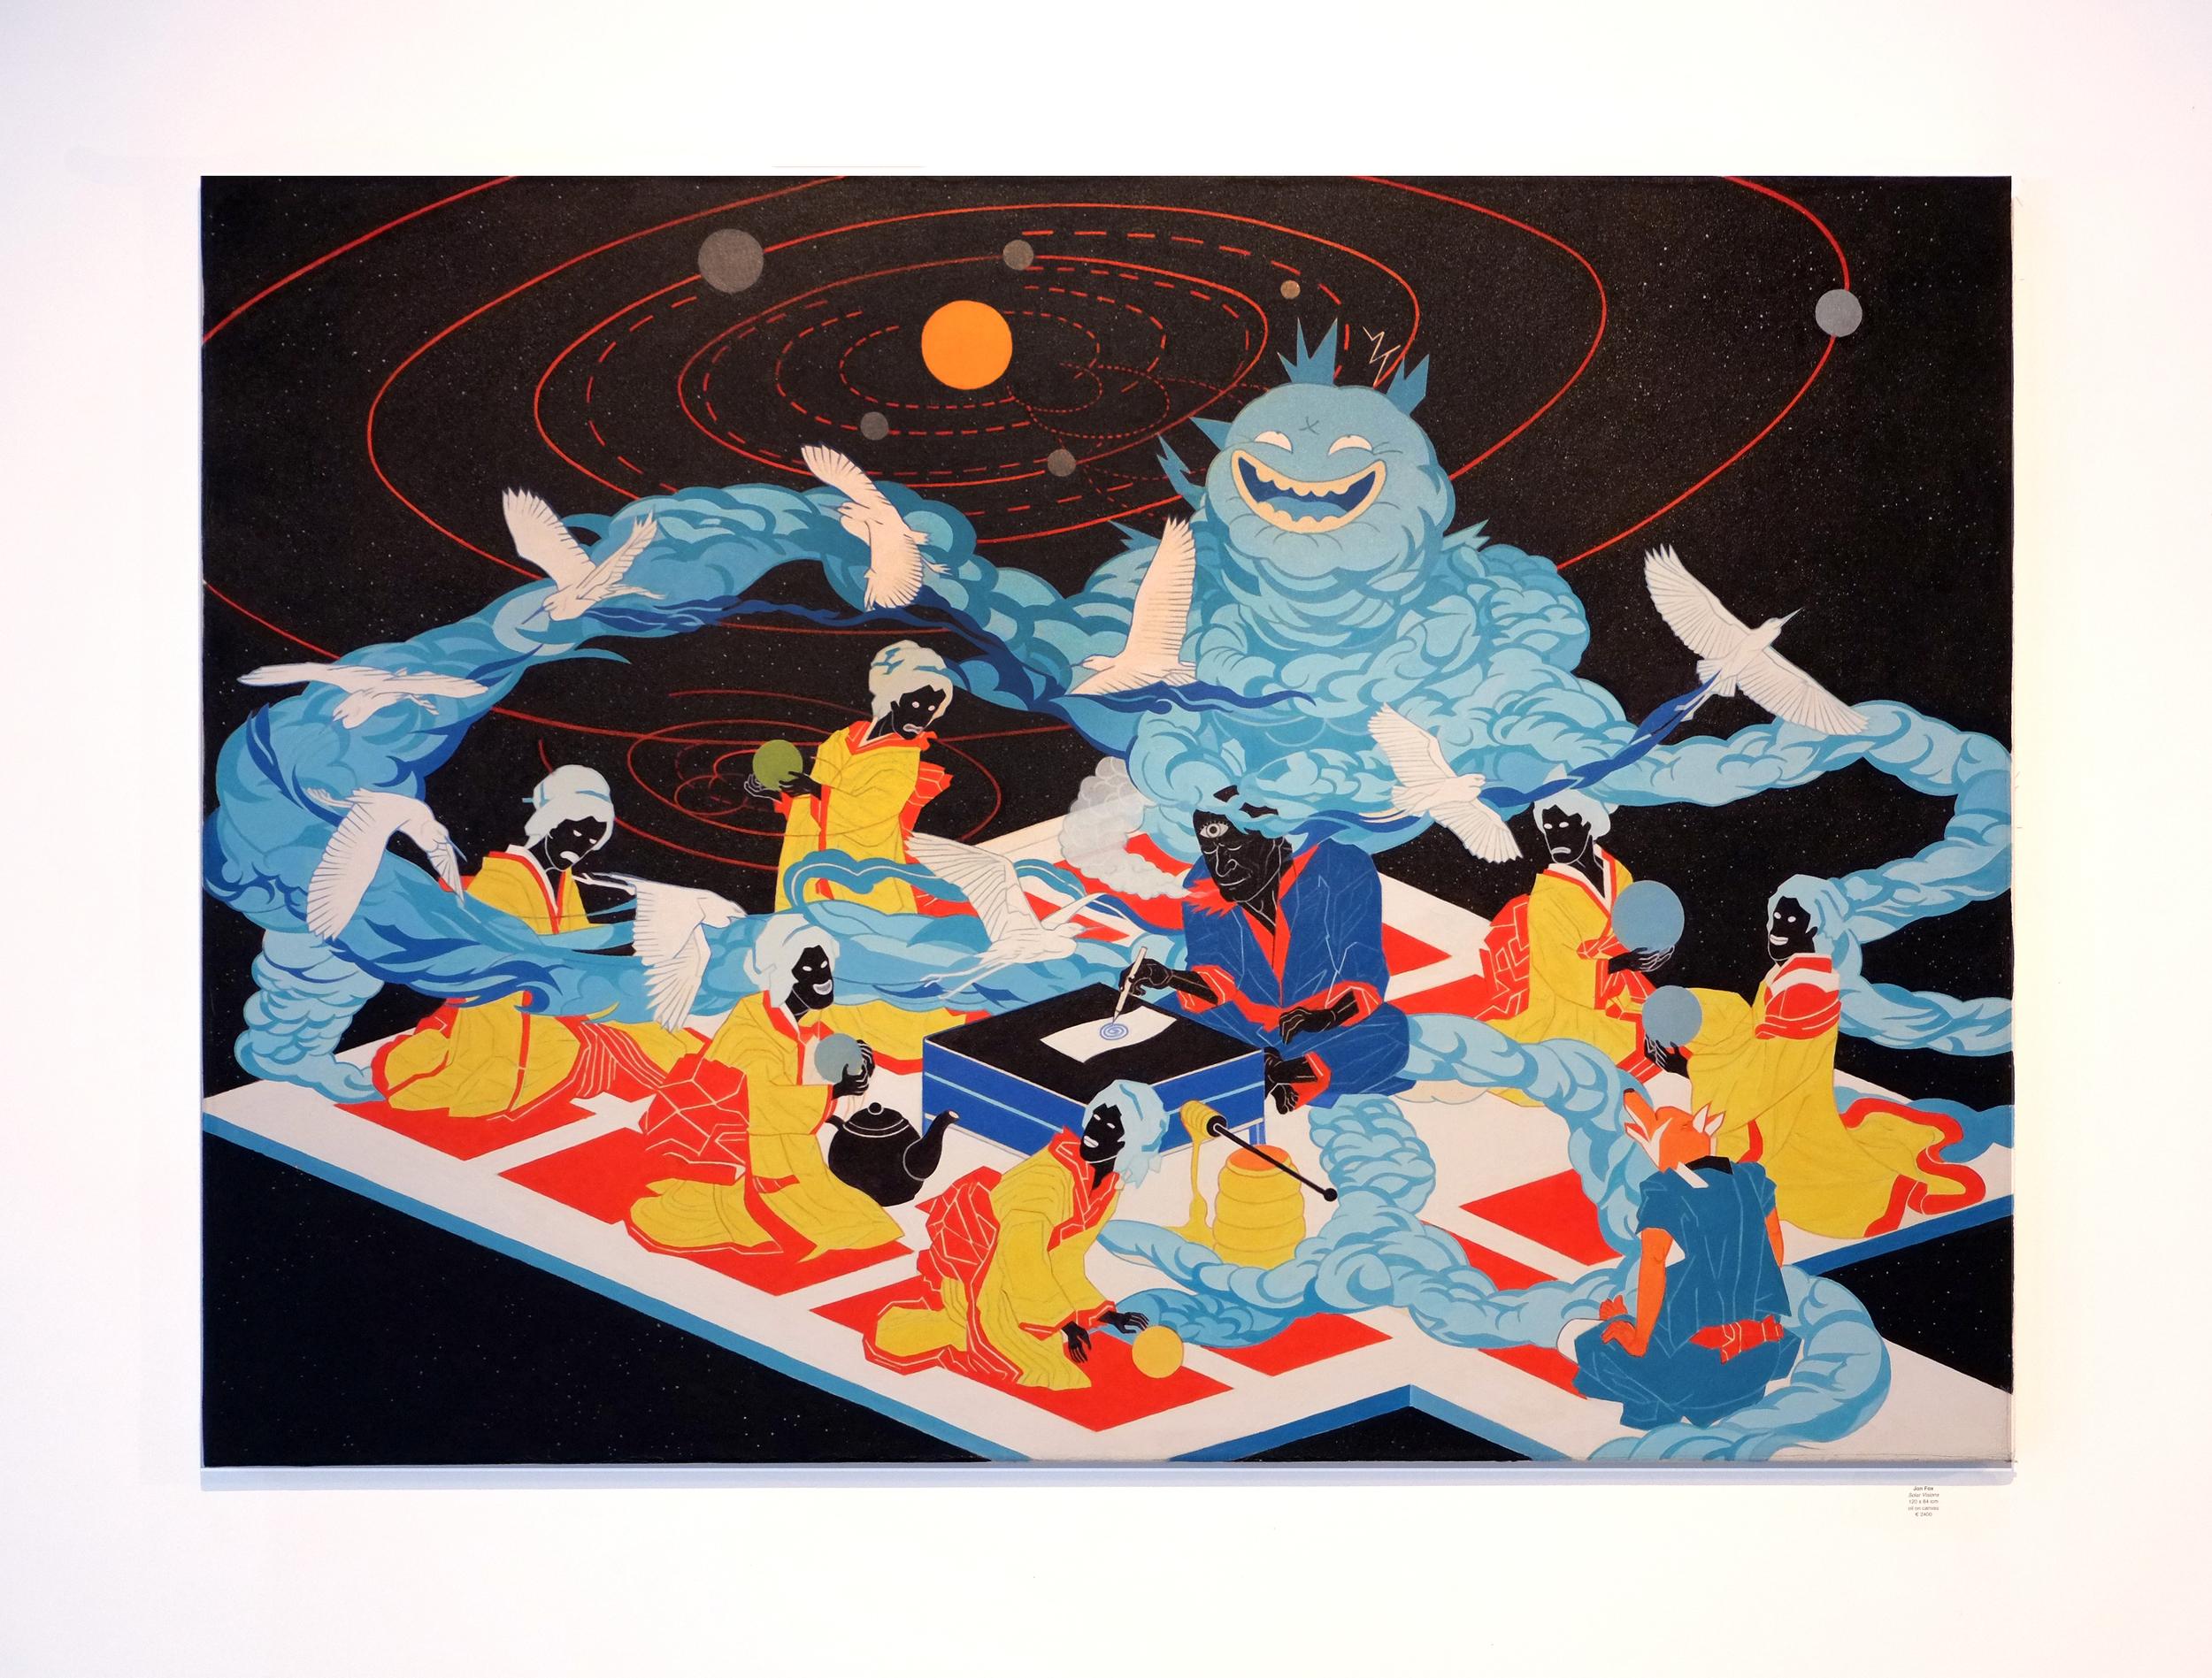 Jon Fox - Solar Visions - oil on canvas - 120 x 84 cm.jpg